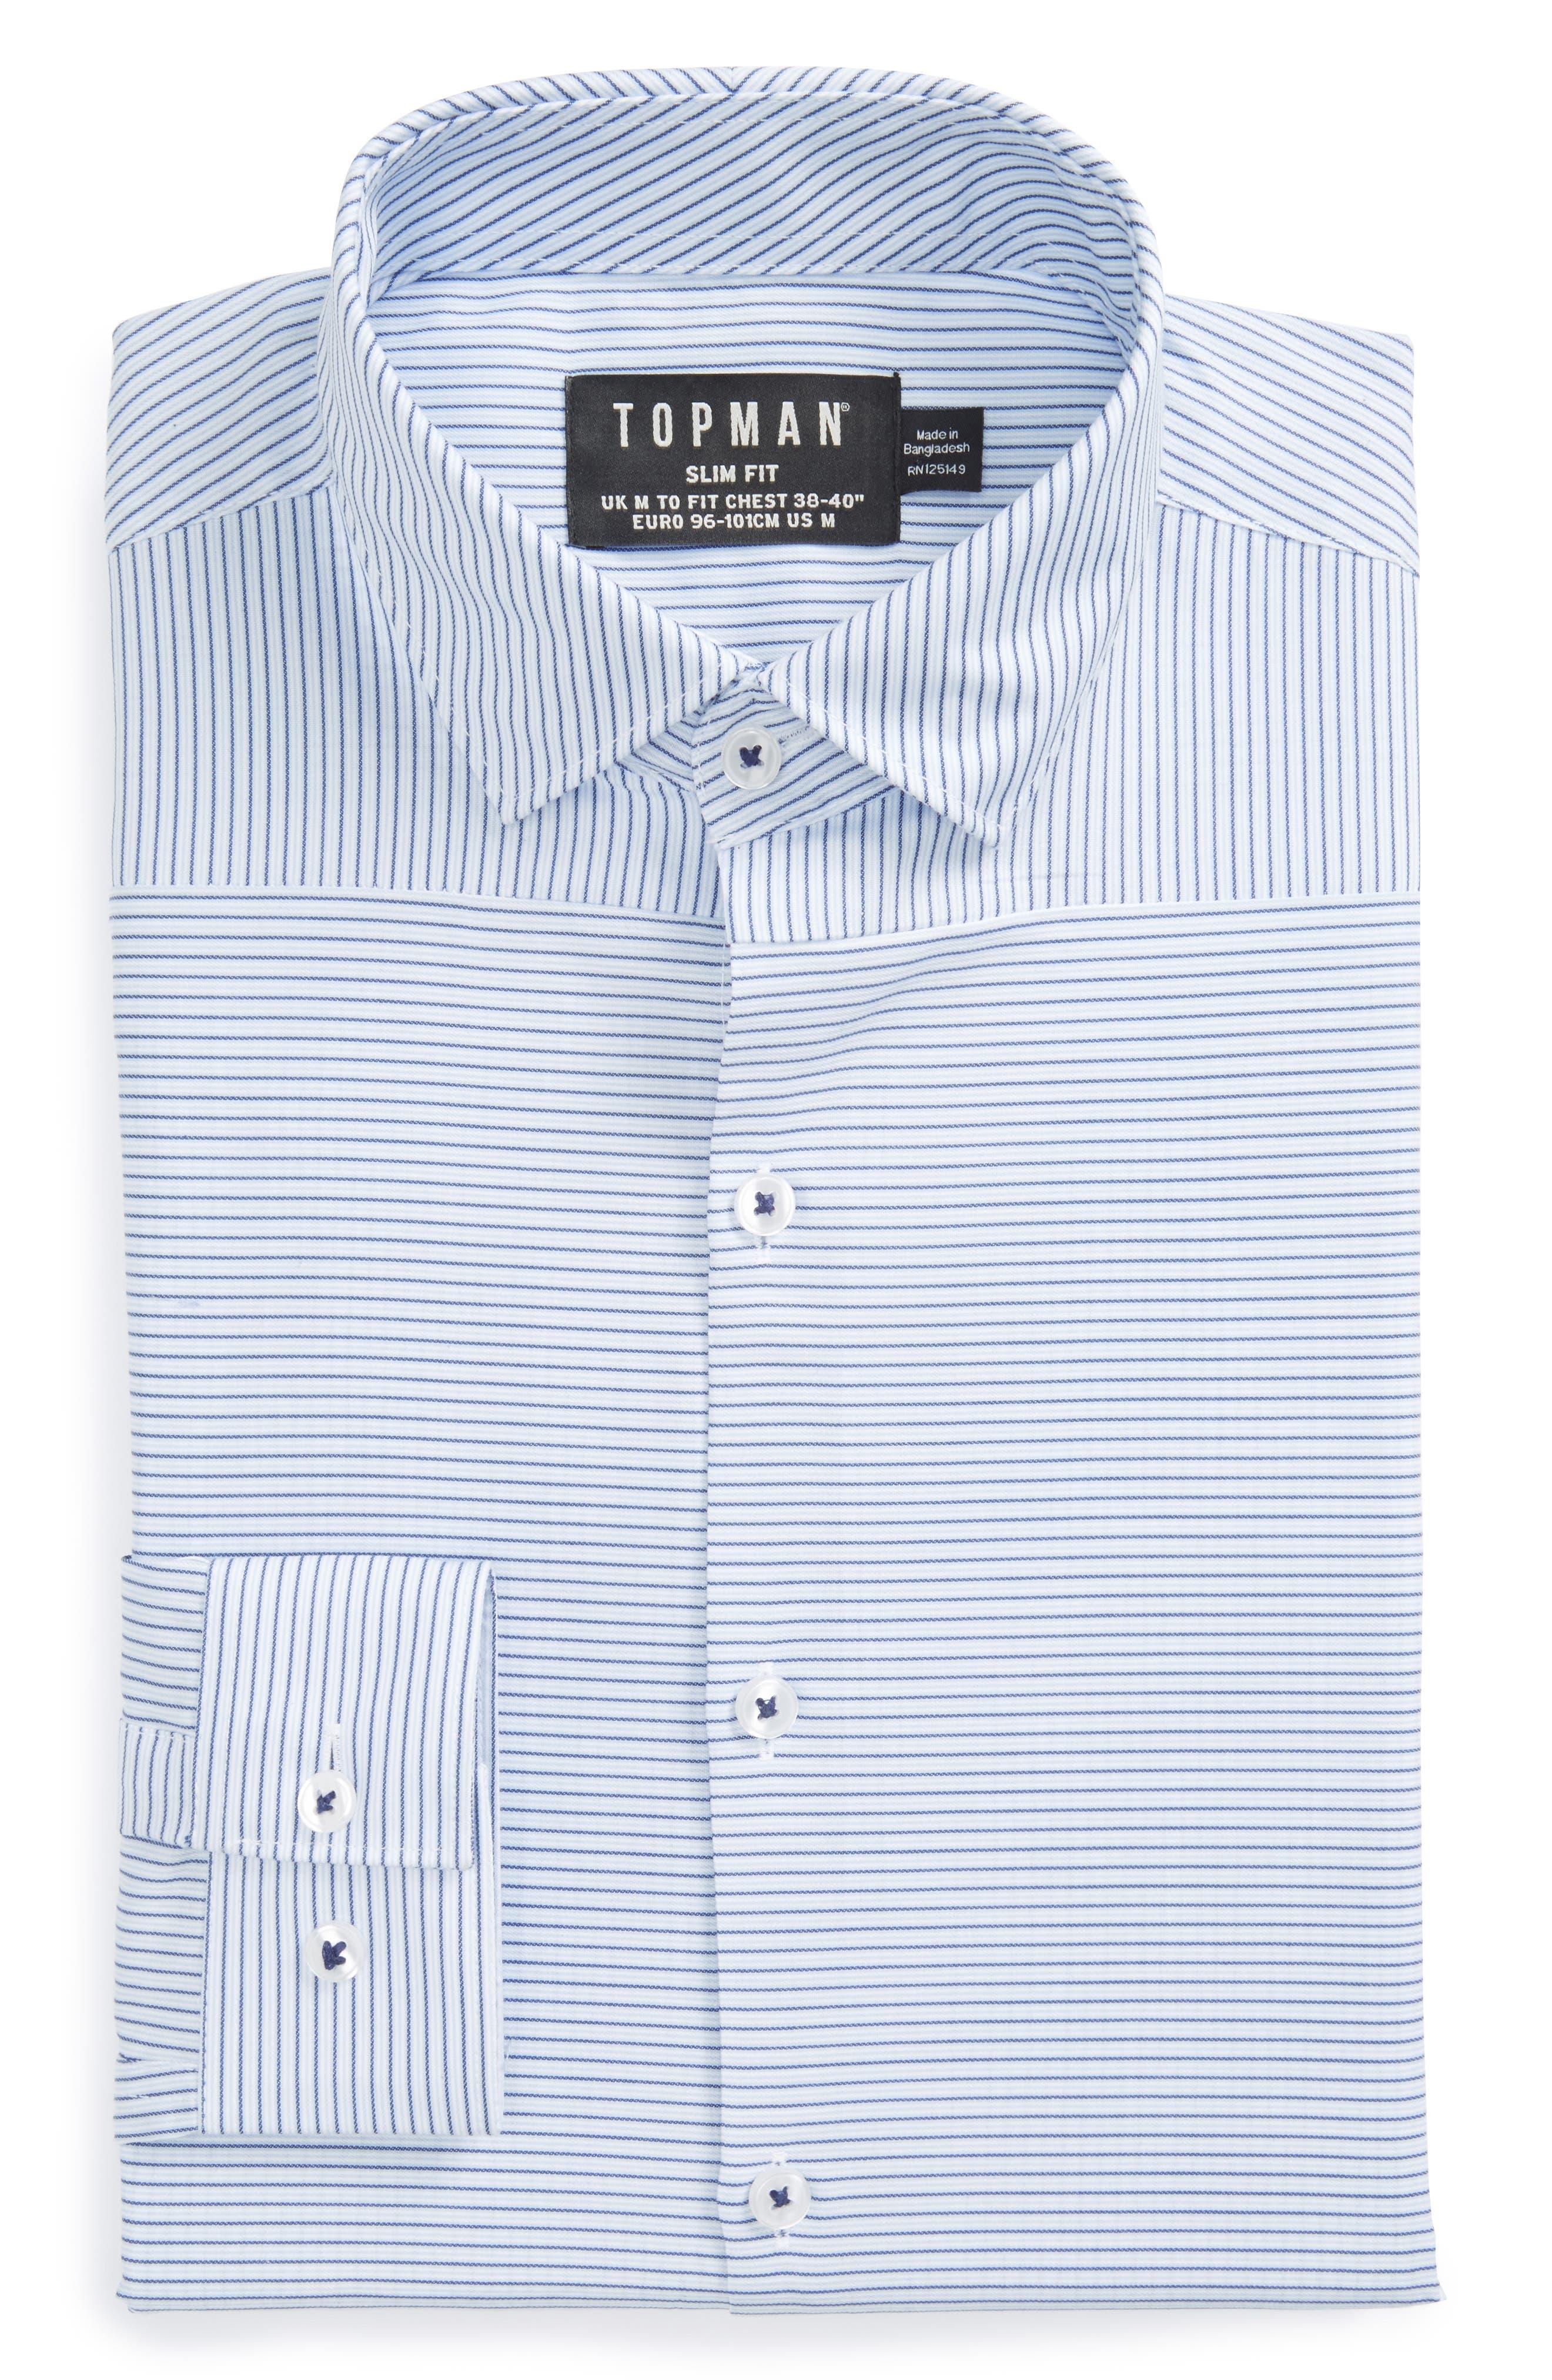 Topman Slim Fit Bias Stripe Dress Shirt